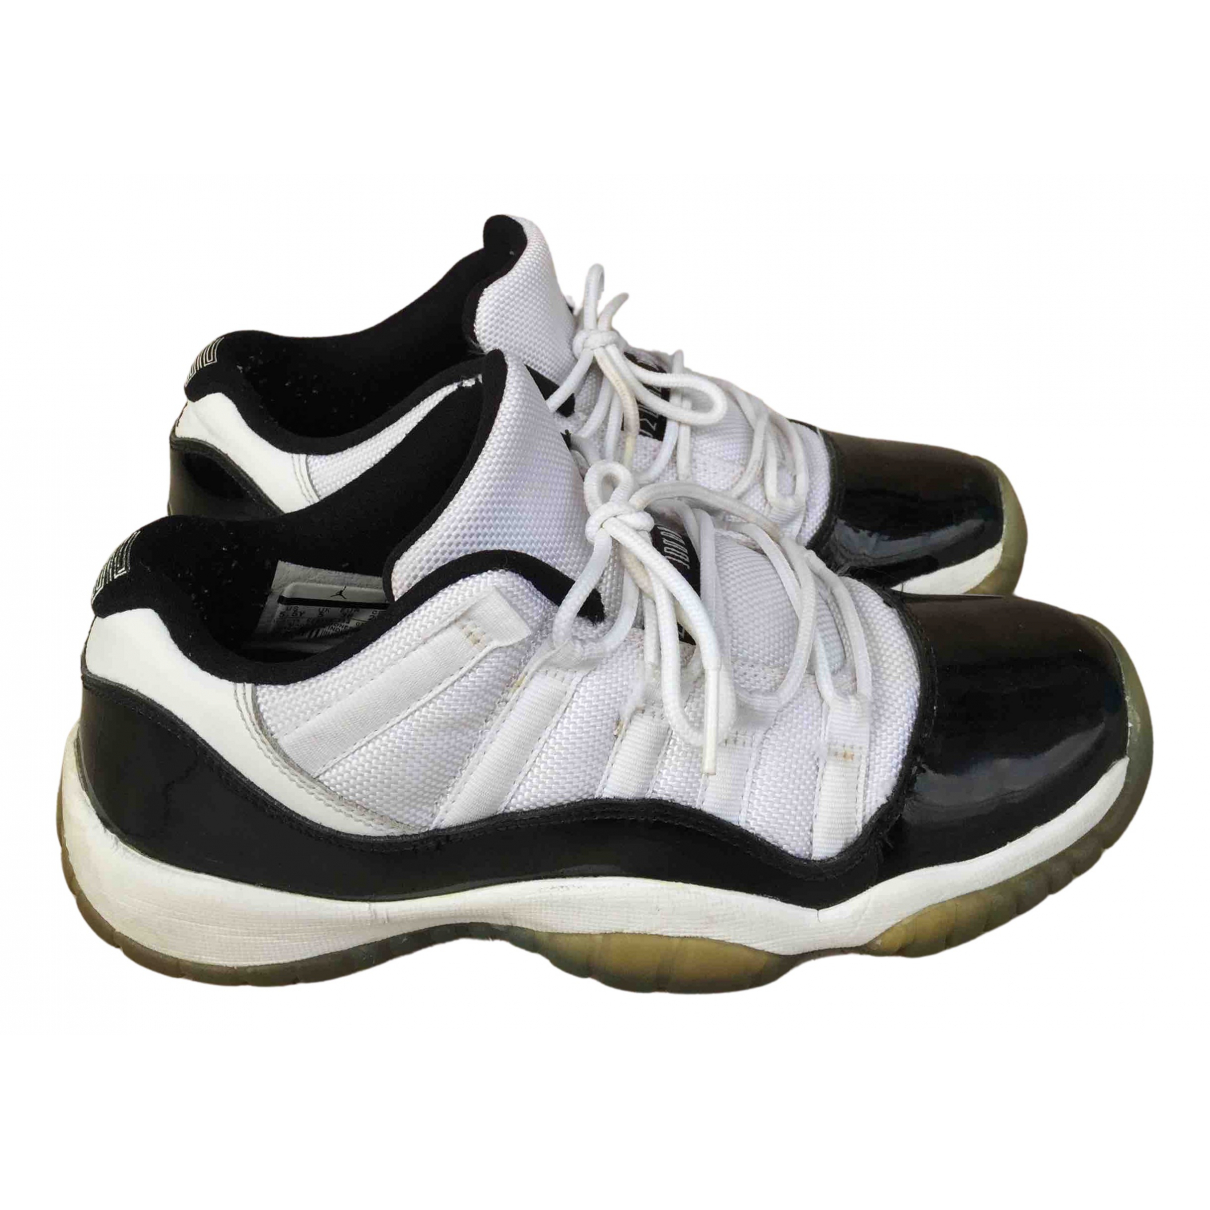 Jordan Air Jordan 11 White Cloth Trainers for Women 38 EU